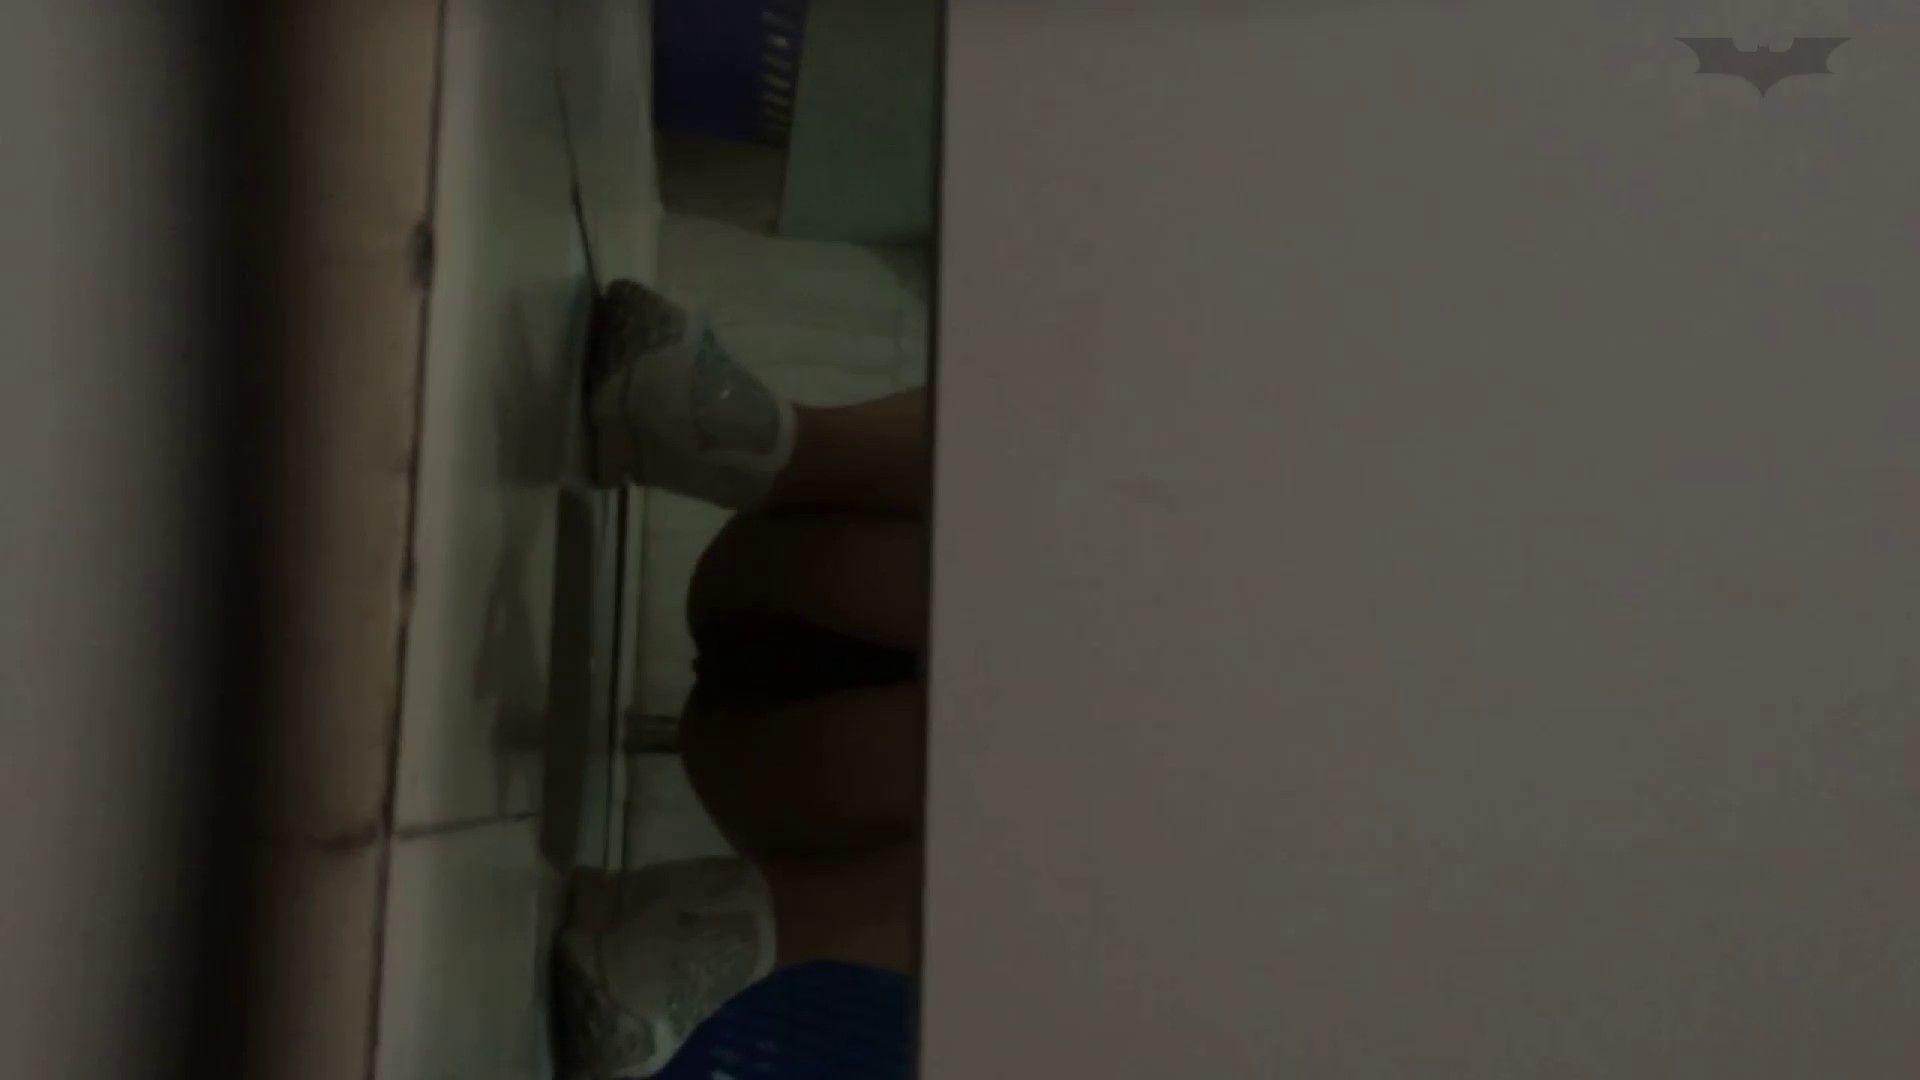 JD盗撮 美女の洗面所の秘密 Vol.45 盗撮 ワレメ動画紹介 80pic 62